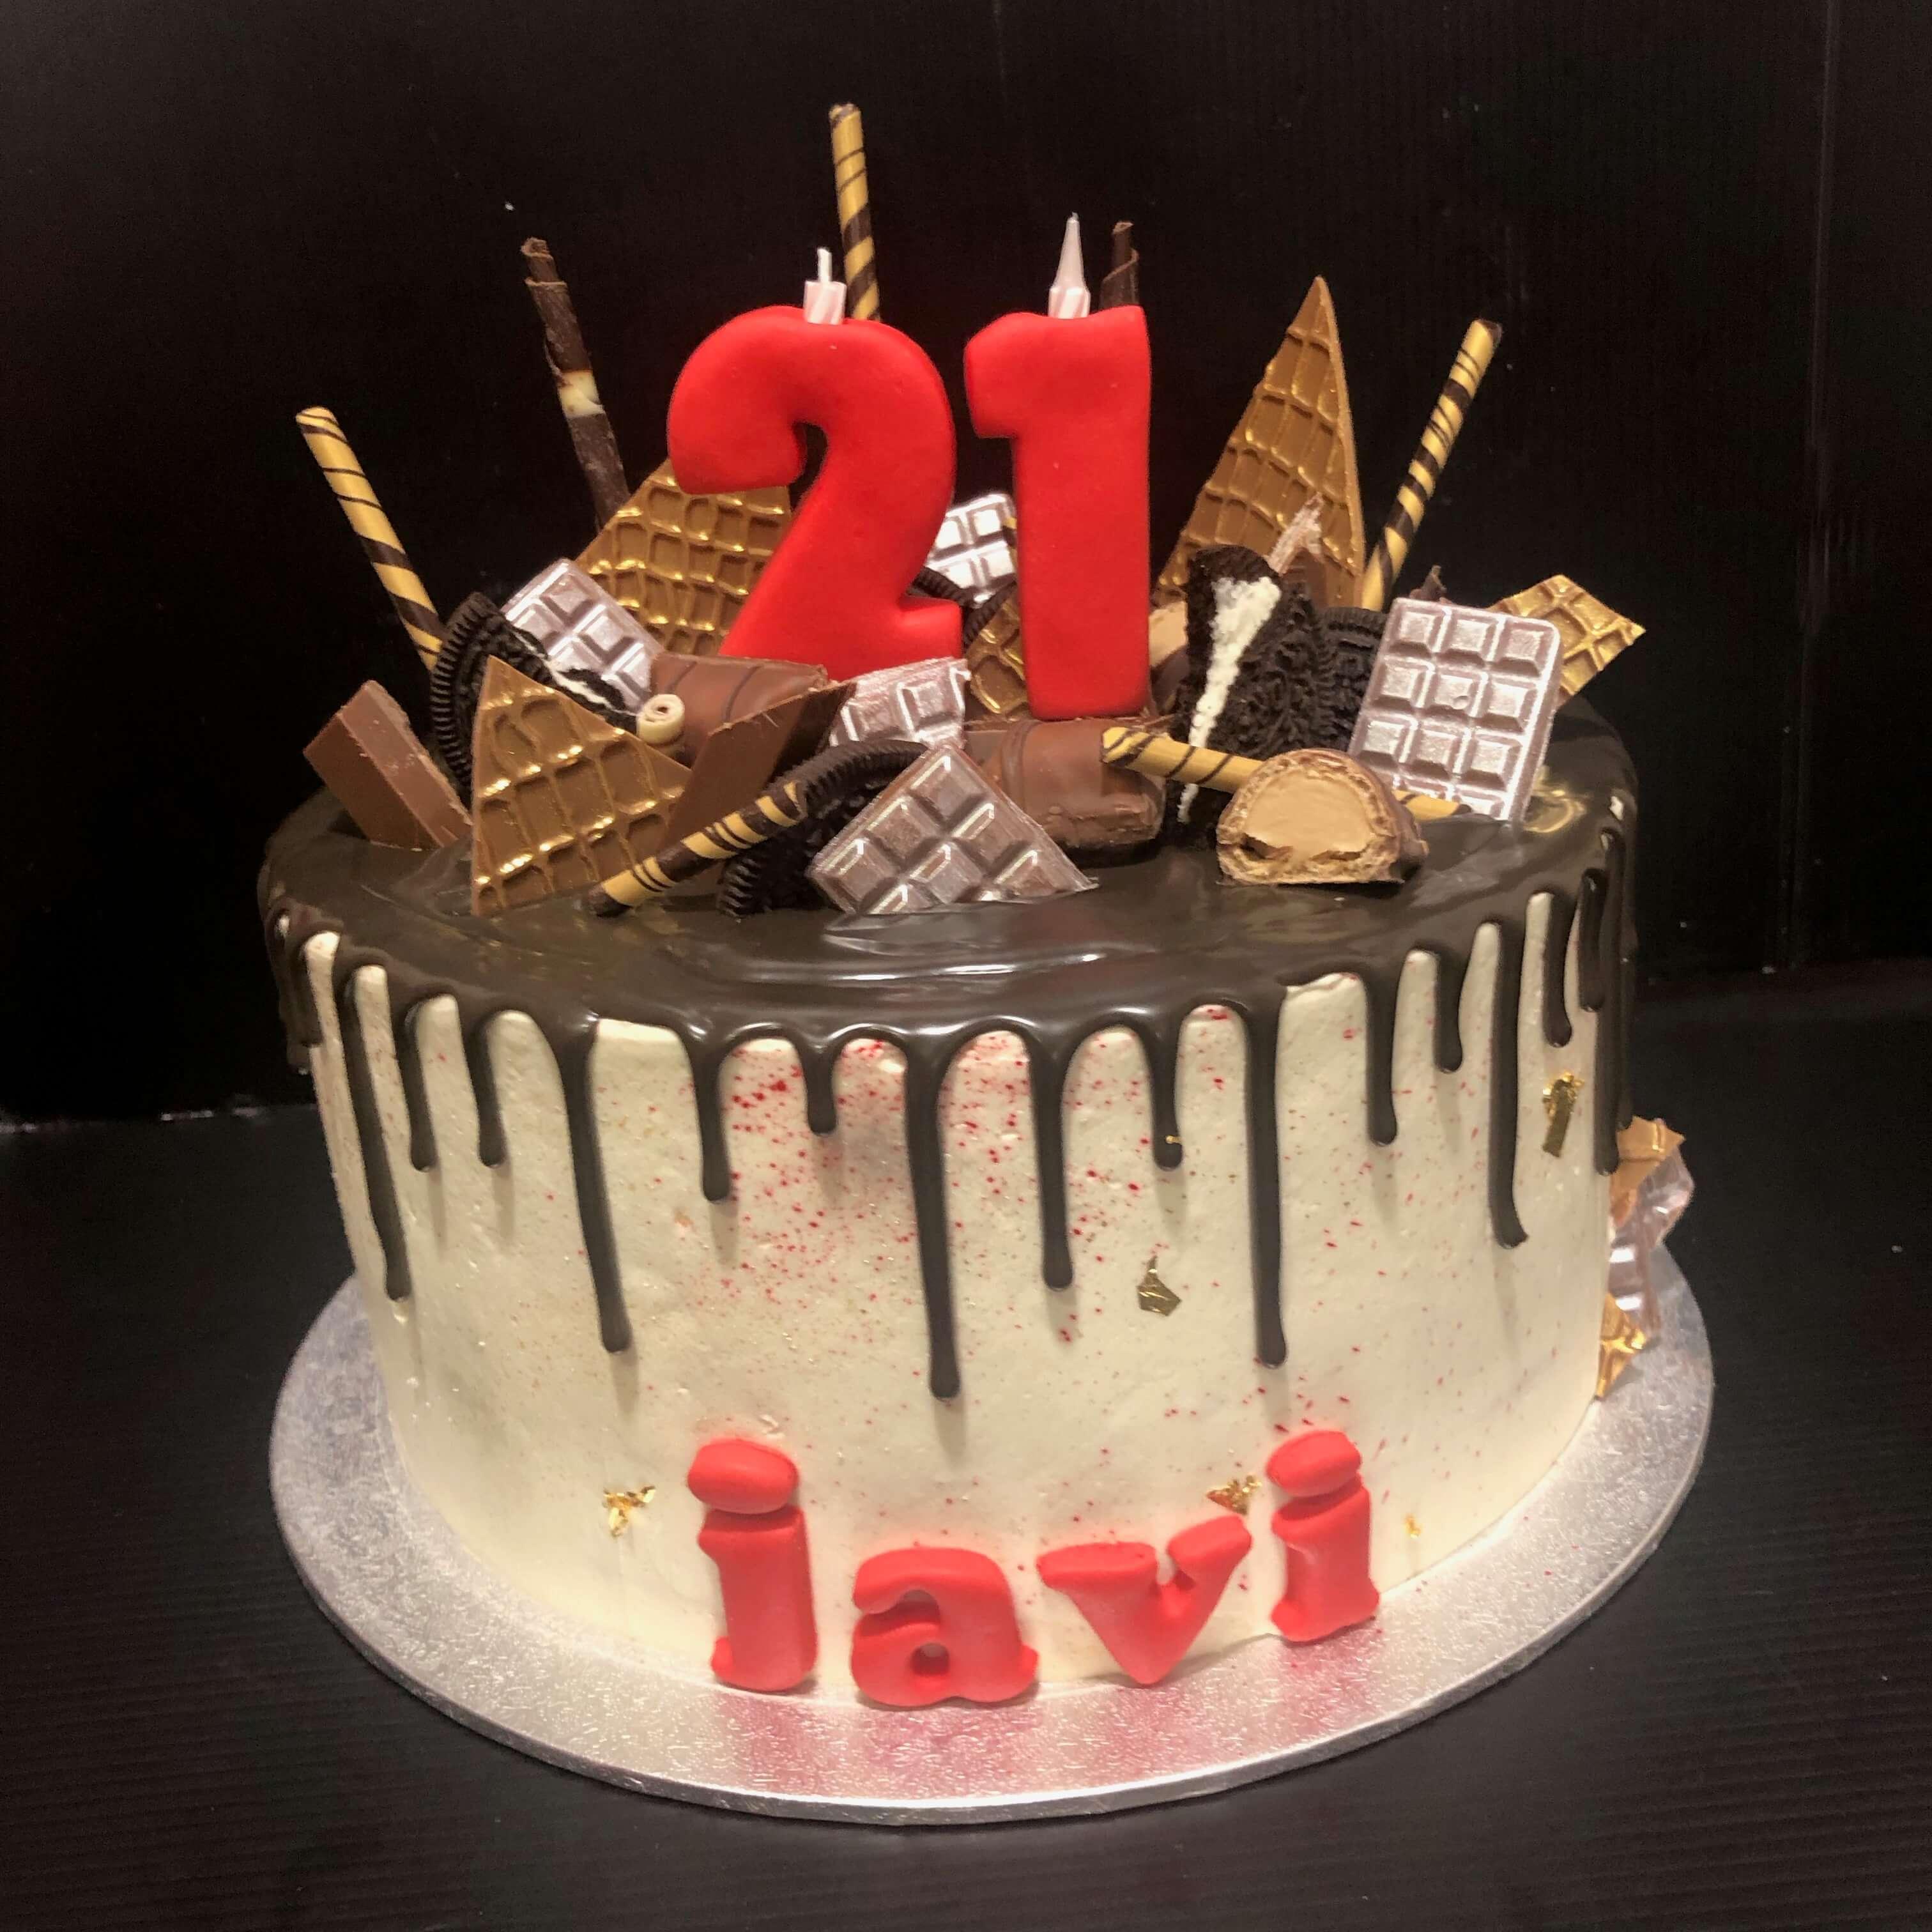 tarta drip cake cumpleaños personalizada macarons coruña tarta drip cake cumpleaños personalizada macarons coruña